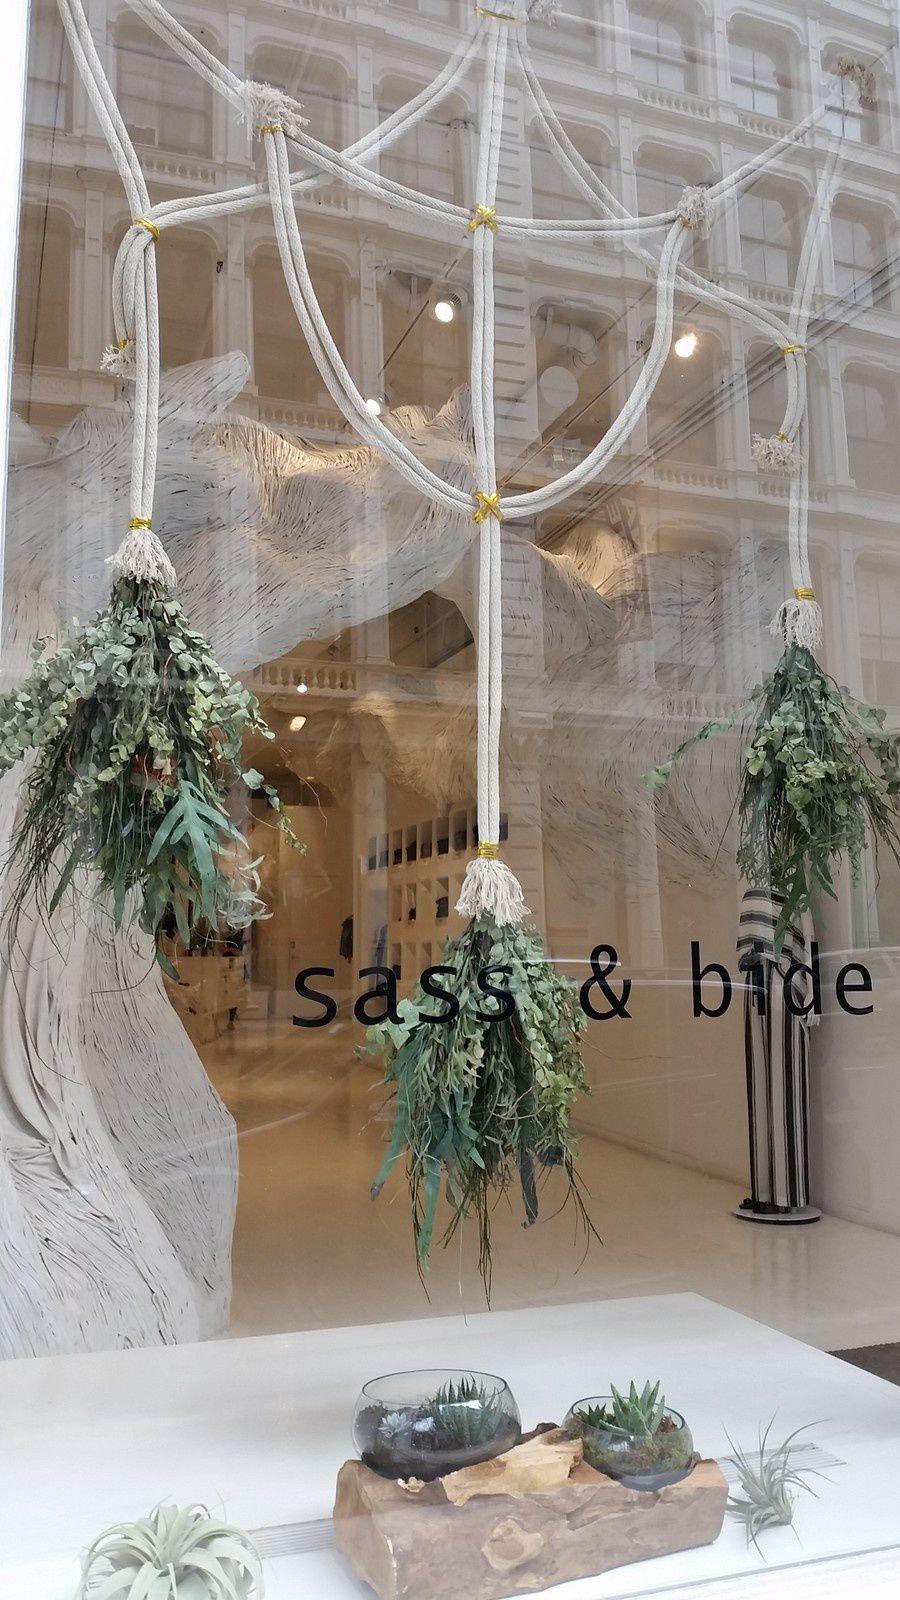 # Altavia store tour New York 1 : le retail design minimalisme à Soho.